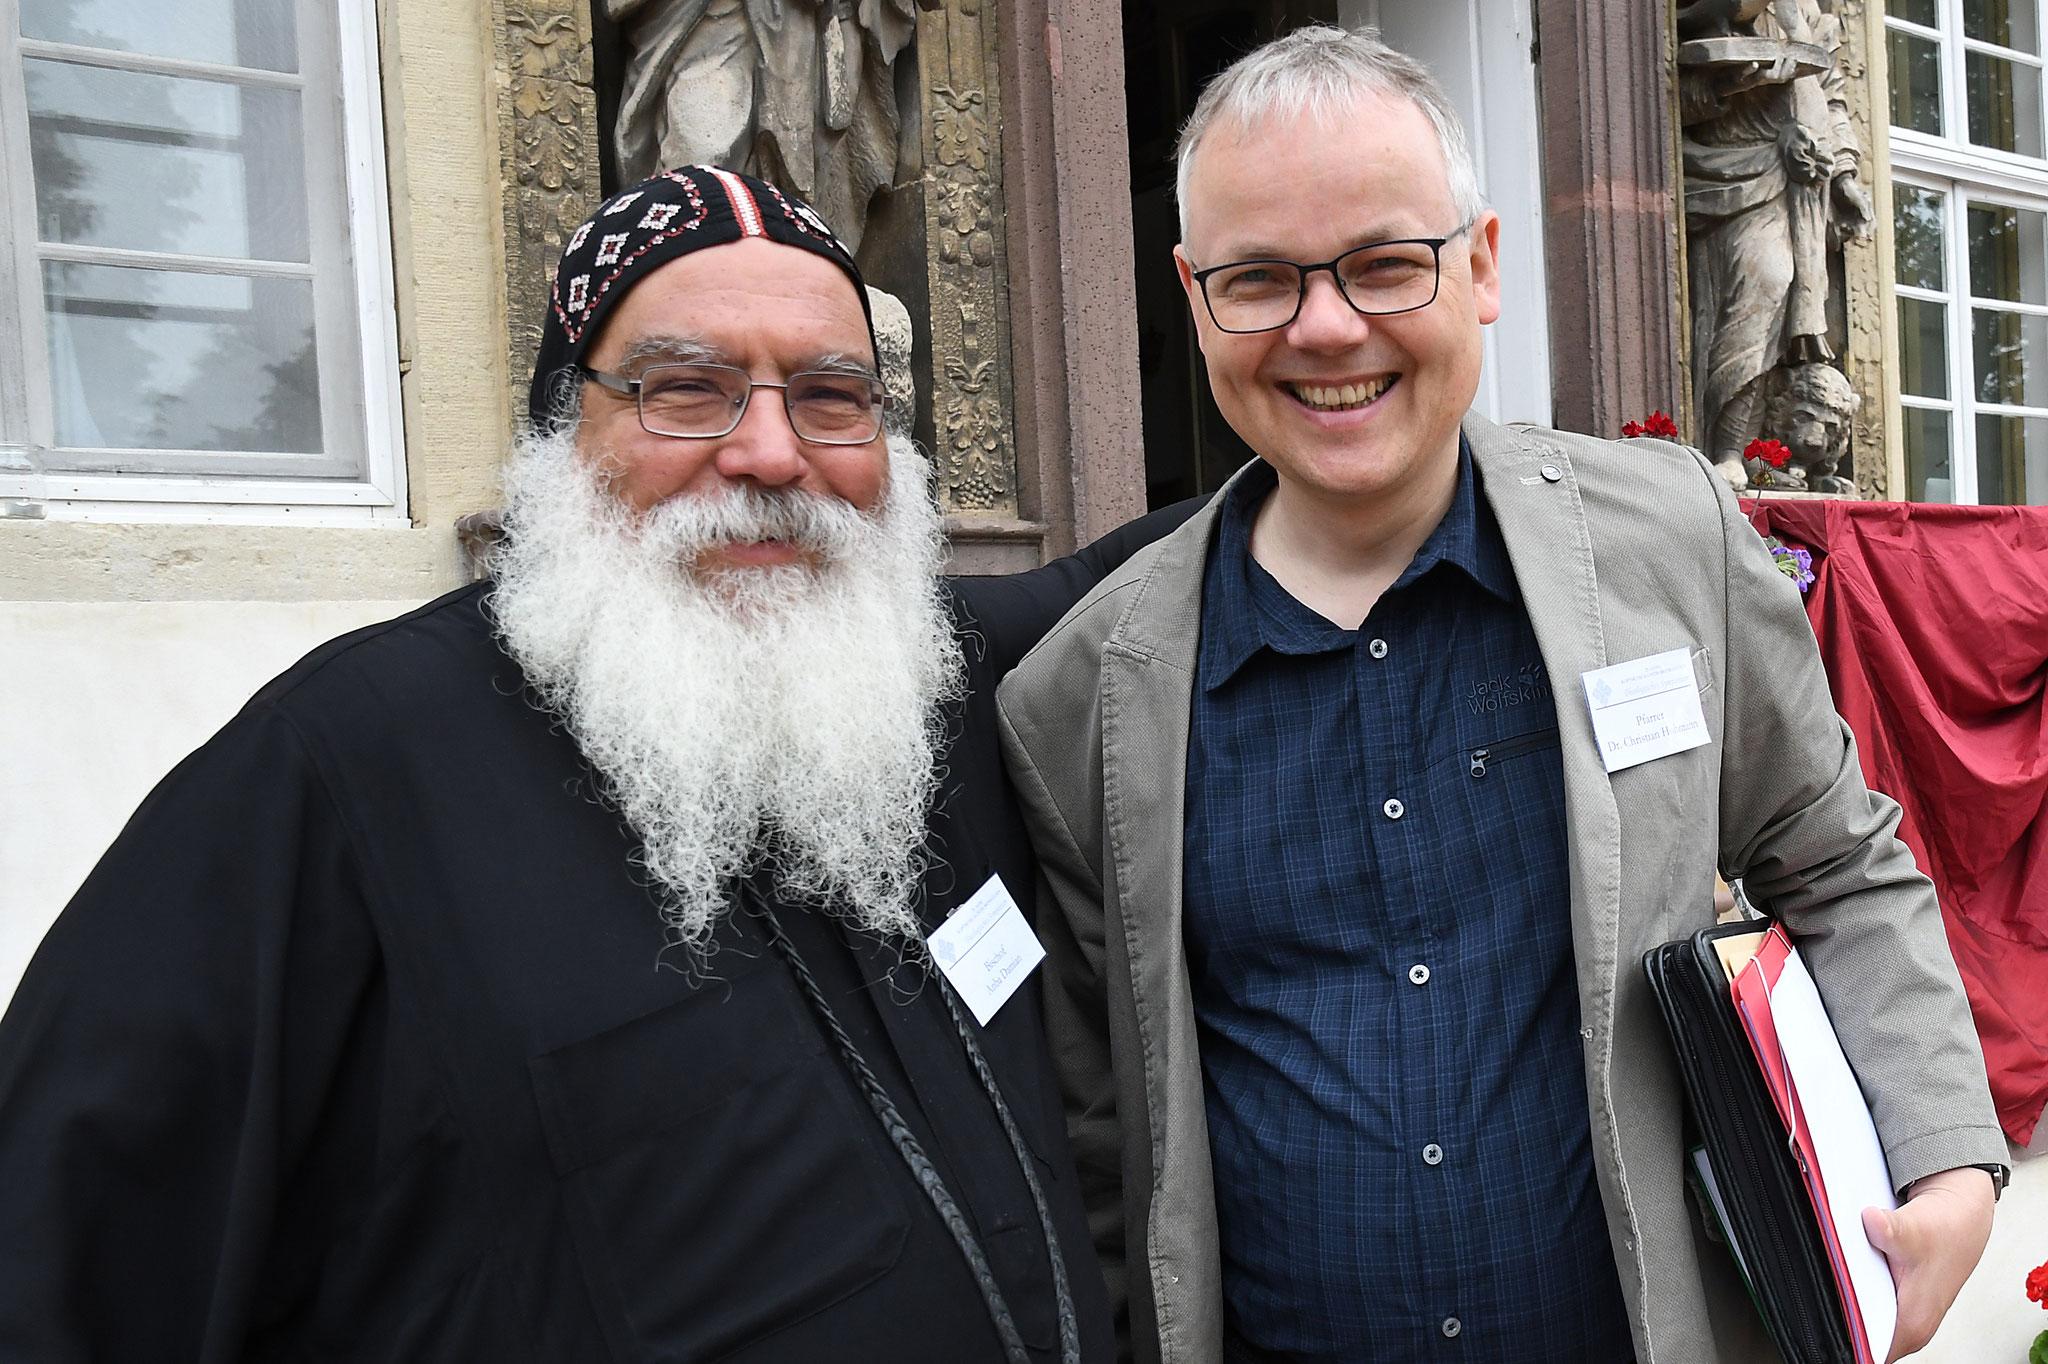 S.E. Bischof Anba Damian und Pfarrer Dr. Christian Hohmann. Foto: Maria Hopp